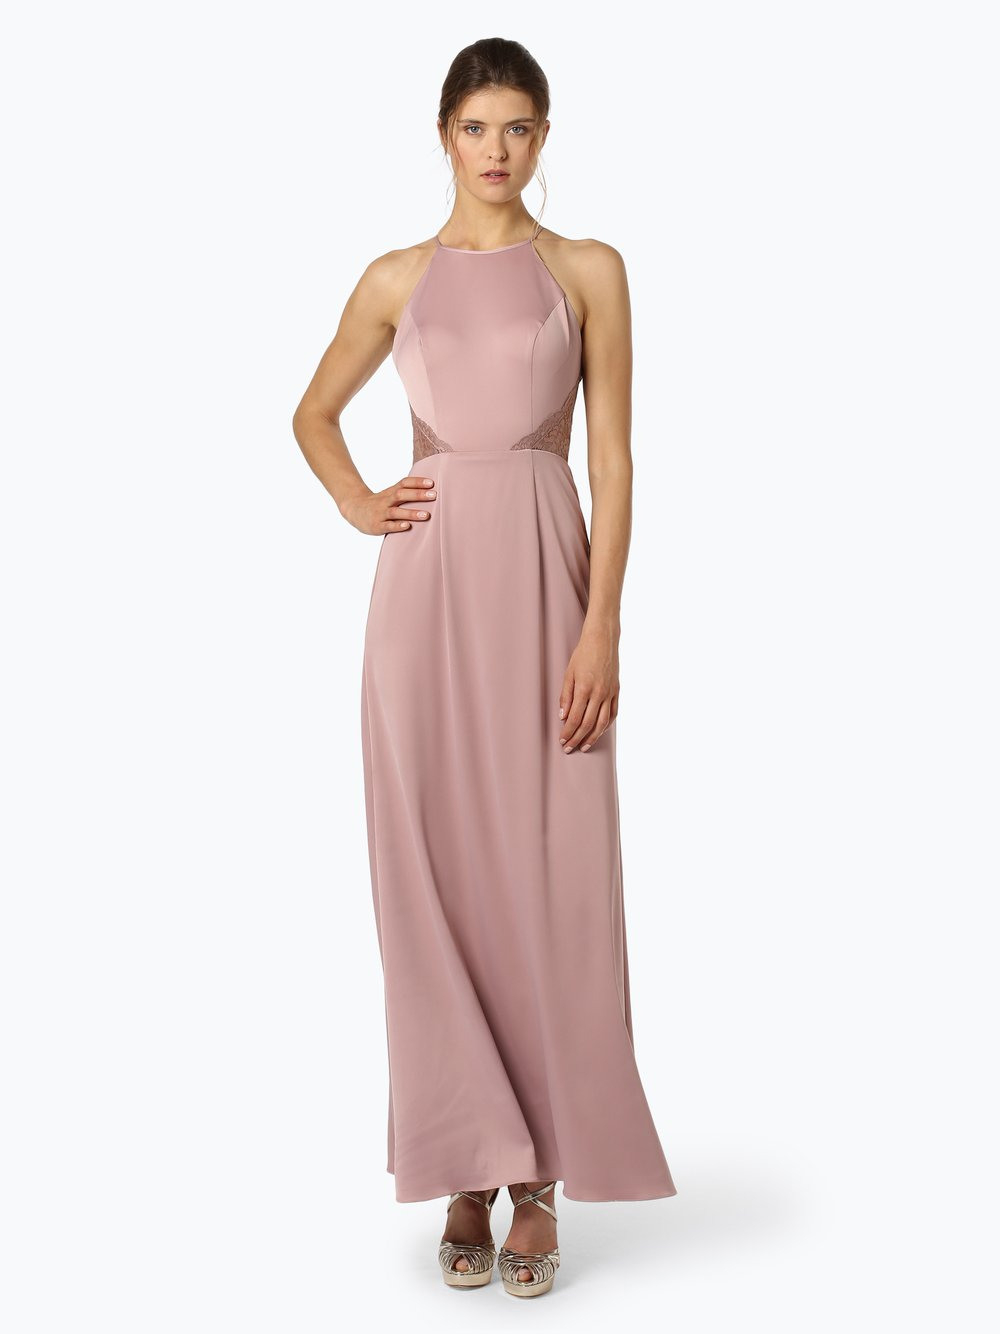 13 Top Laona Damen Abendkleid ÄrmelFormal Großartig Laona Damen Abendkleid Ärmel